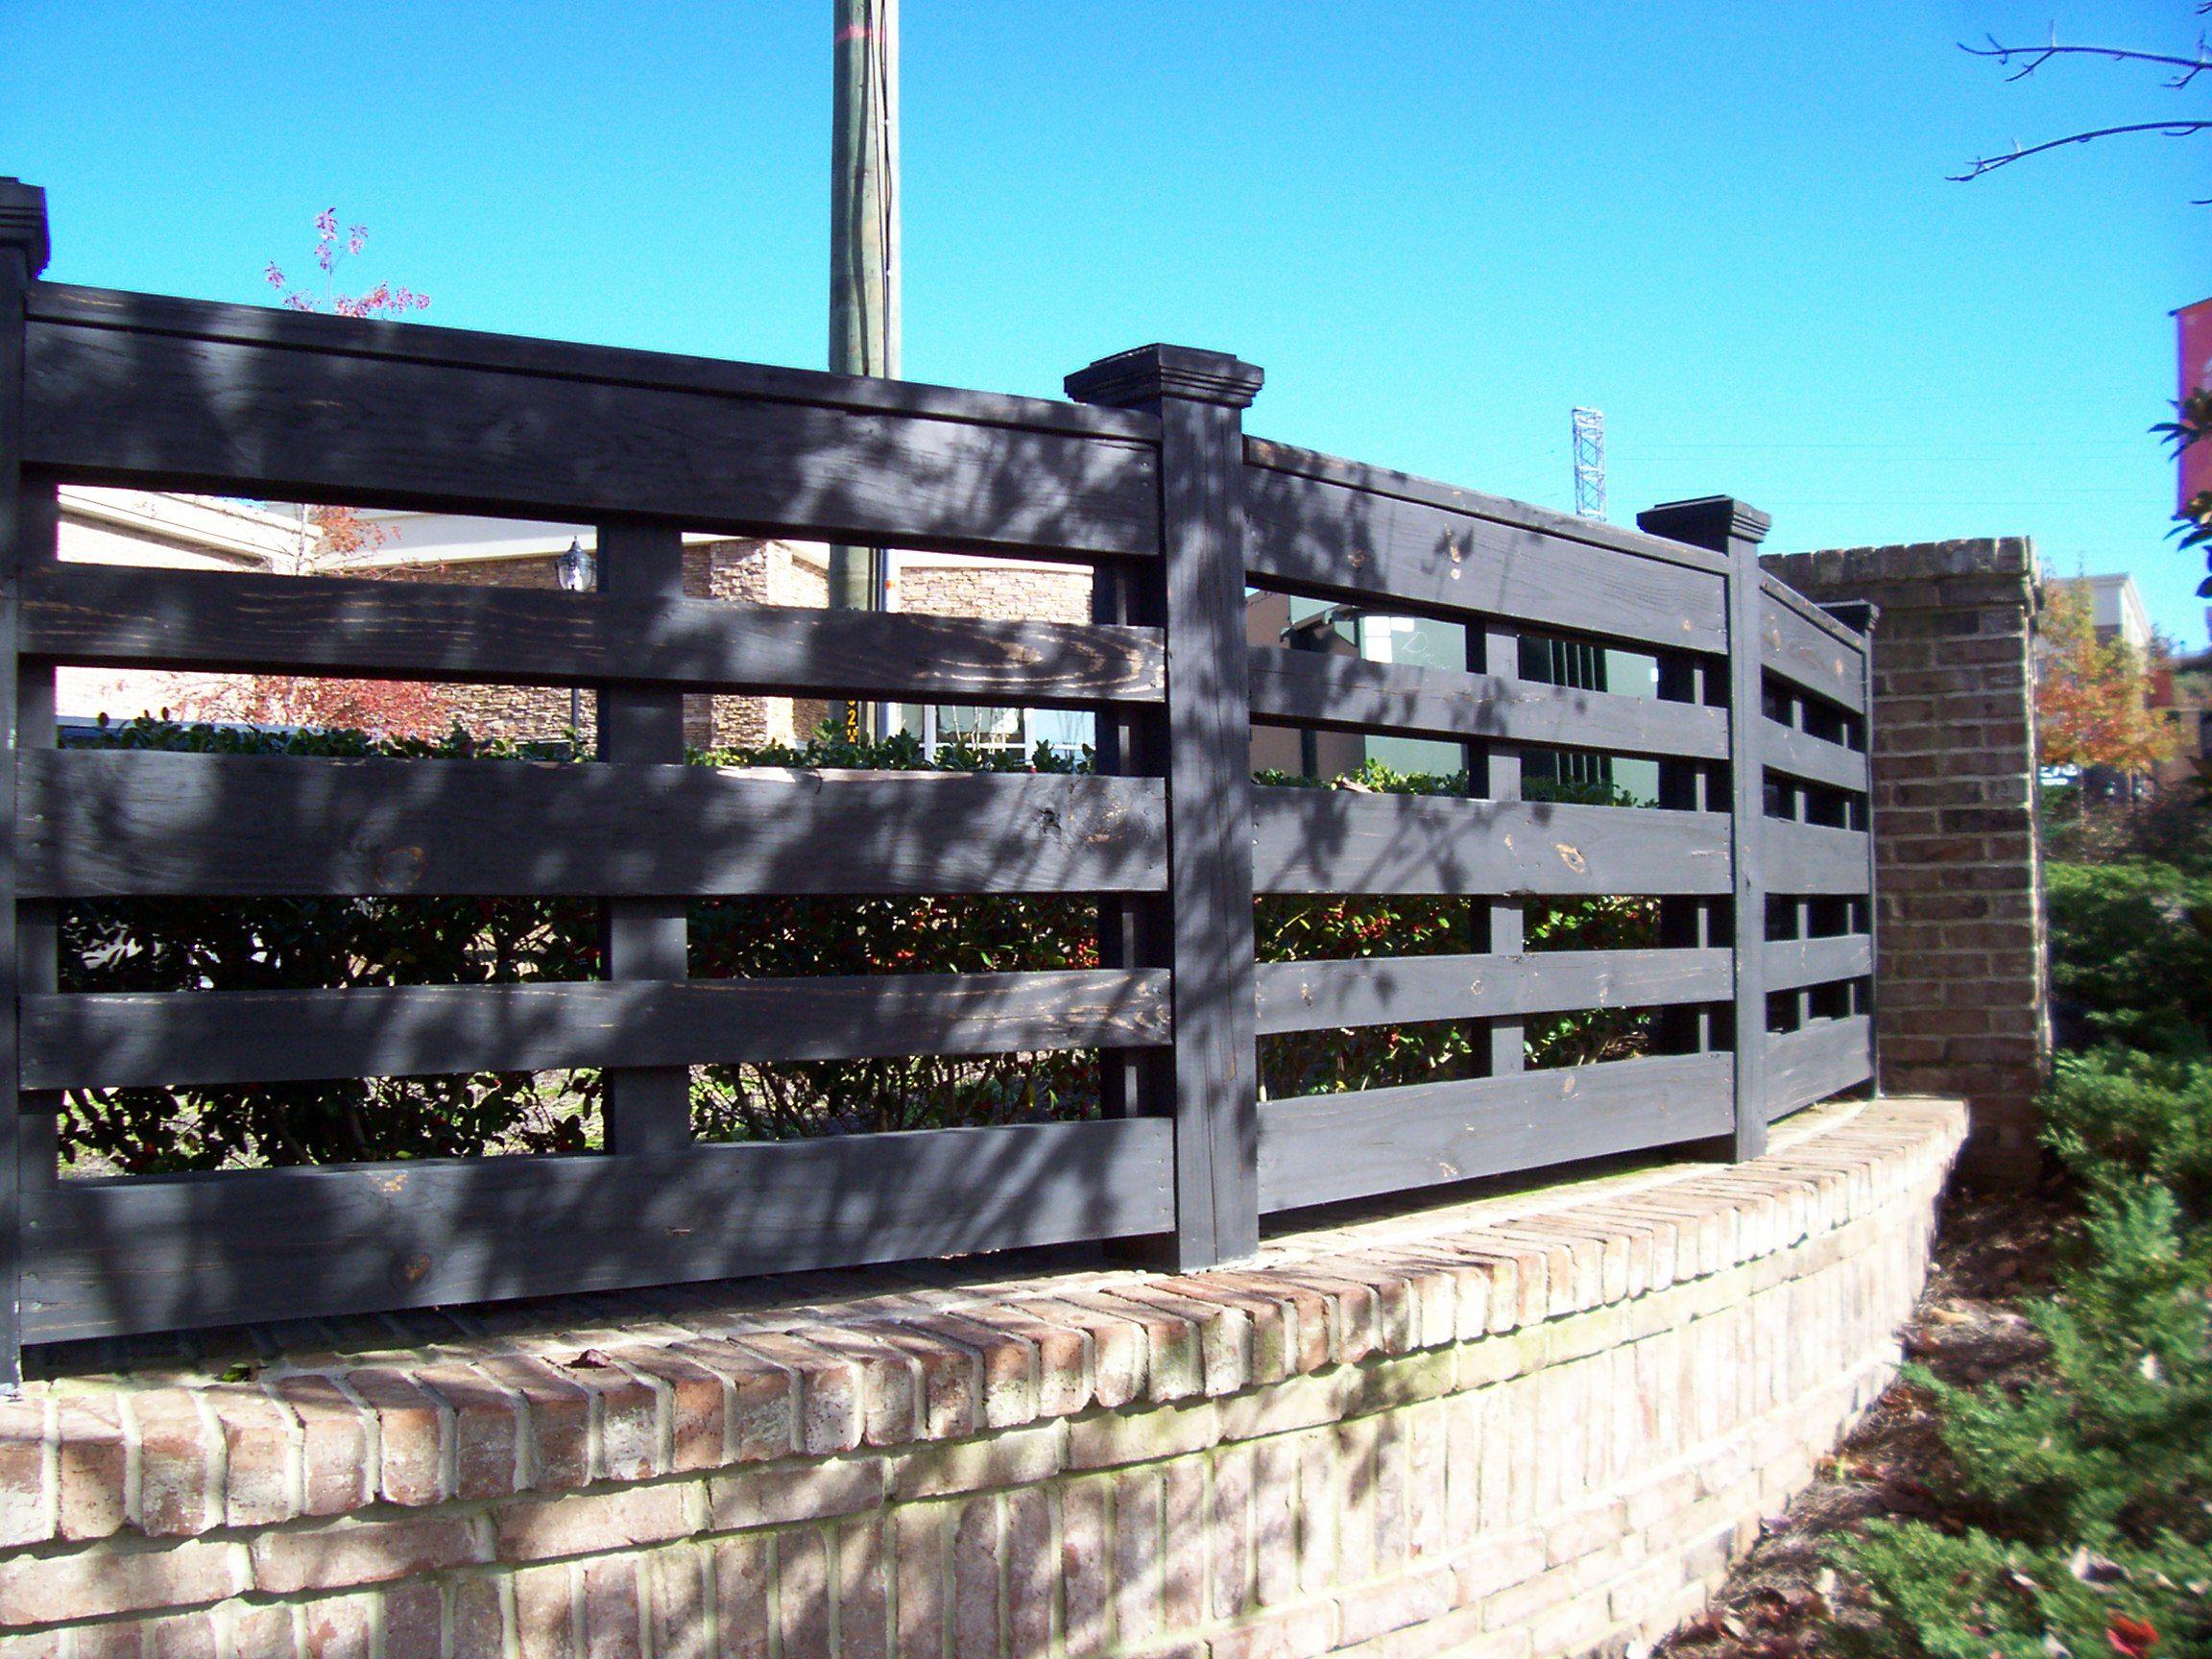 Custom black wood horse fence design by mossy oak fence company custom black wood horse fence design by mossy oak fence company orlando and melbourne baanklon Gallery